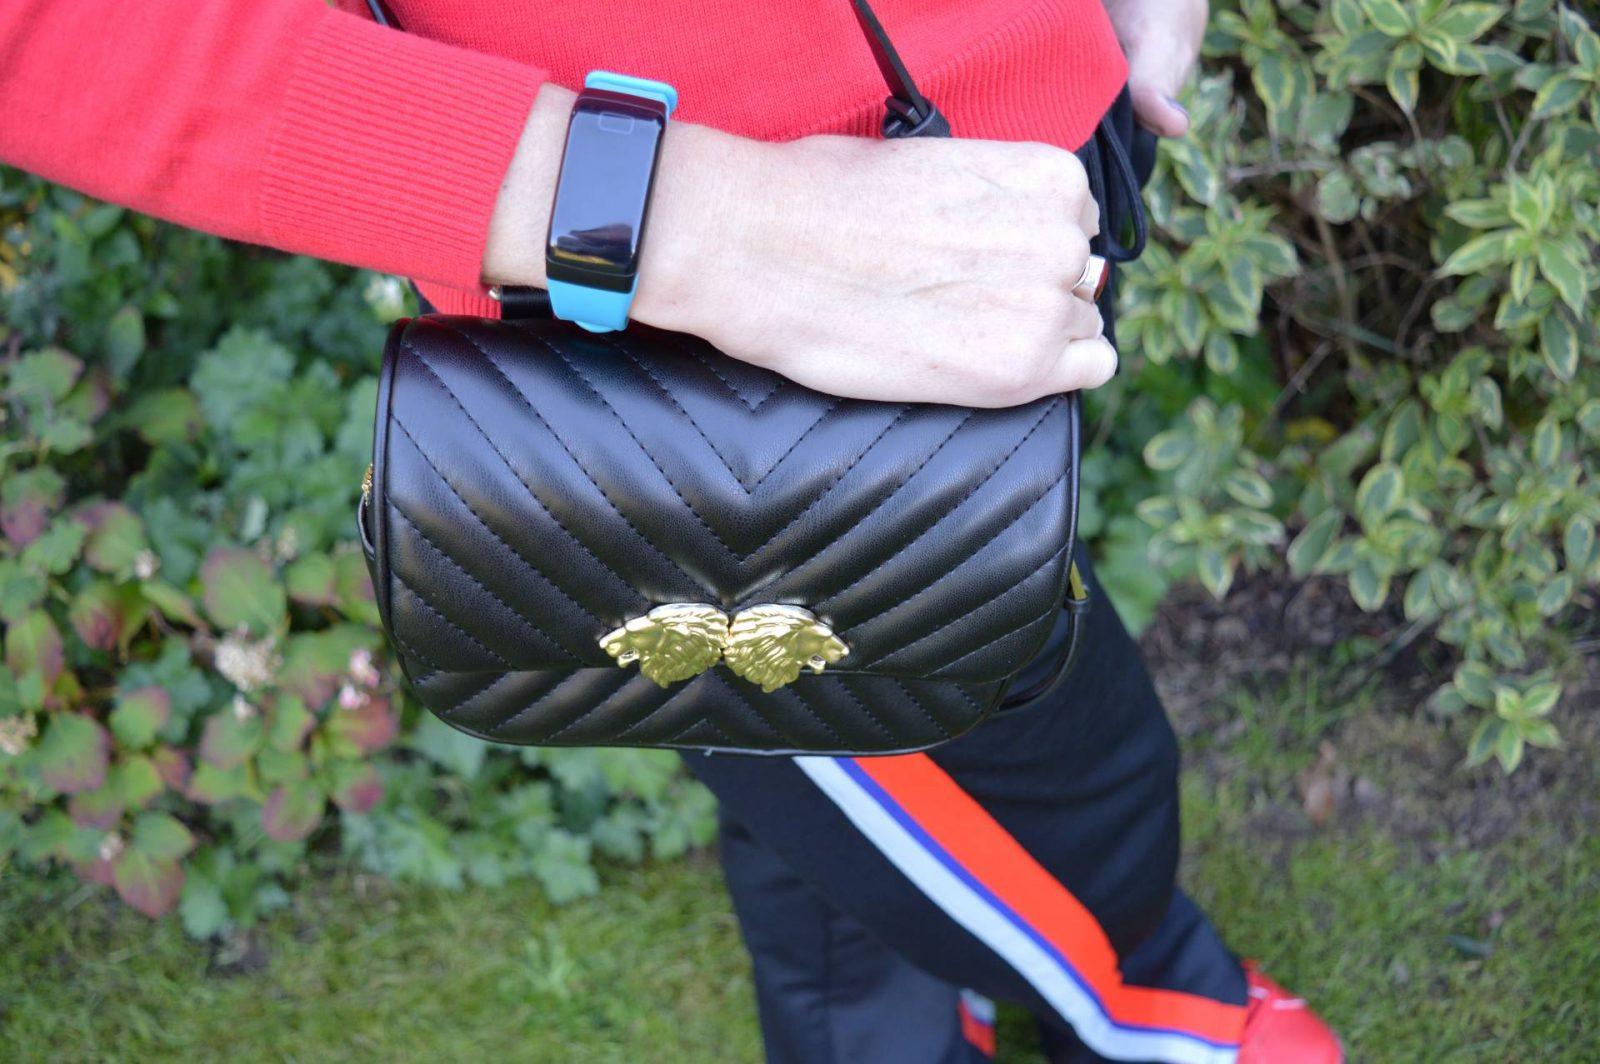 Dressing for comfort in athleisure, black Zara beltbag, FourFit health band